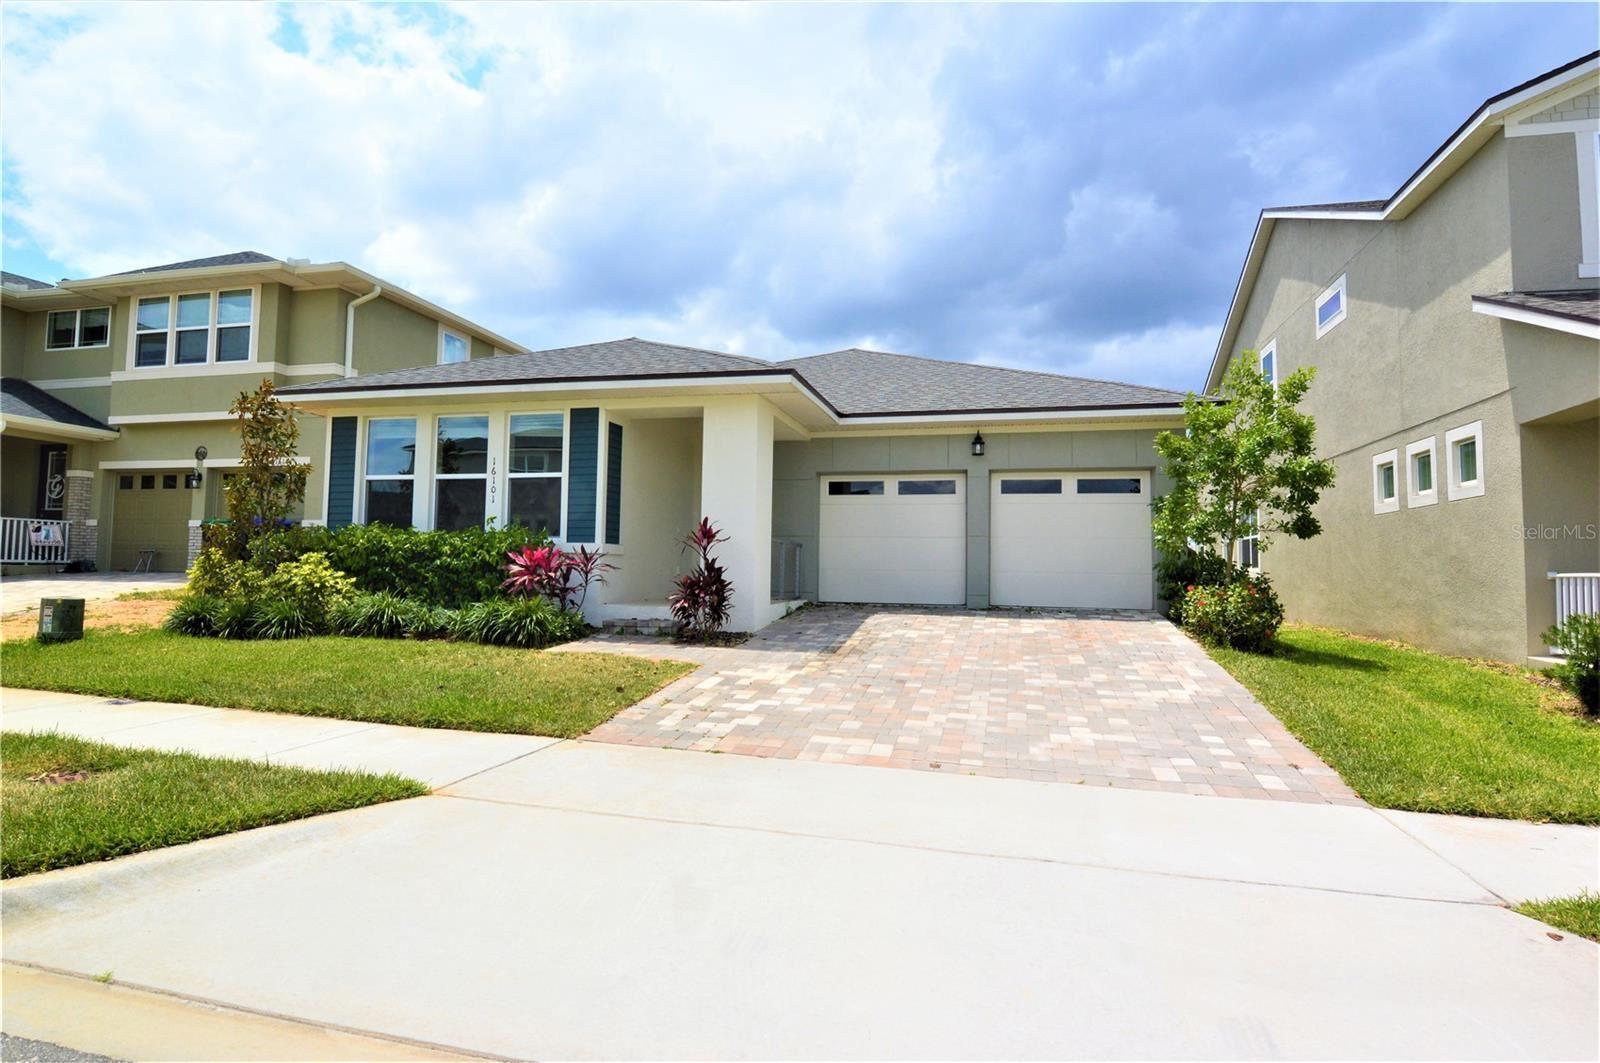 16101 PARKWYN STREET, Winter Garden, FL 34787 - #: O5947295